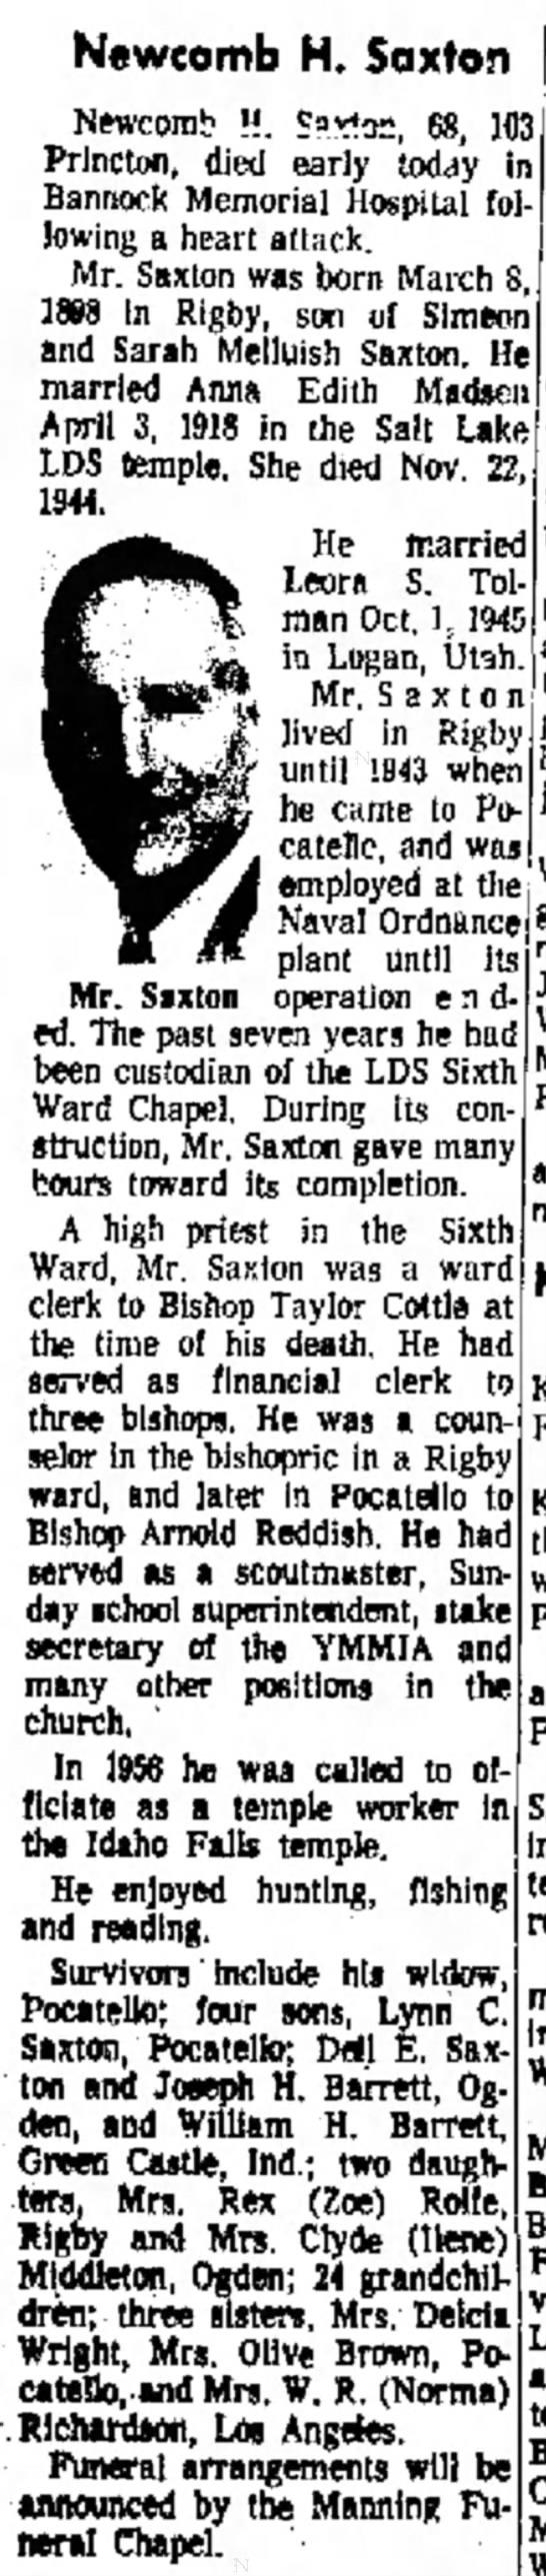 Obituary of Newcomb H. Saxton (1898-1966)